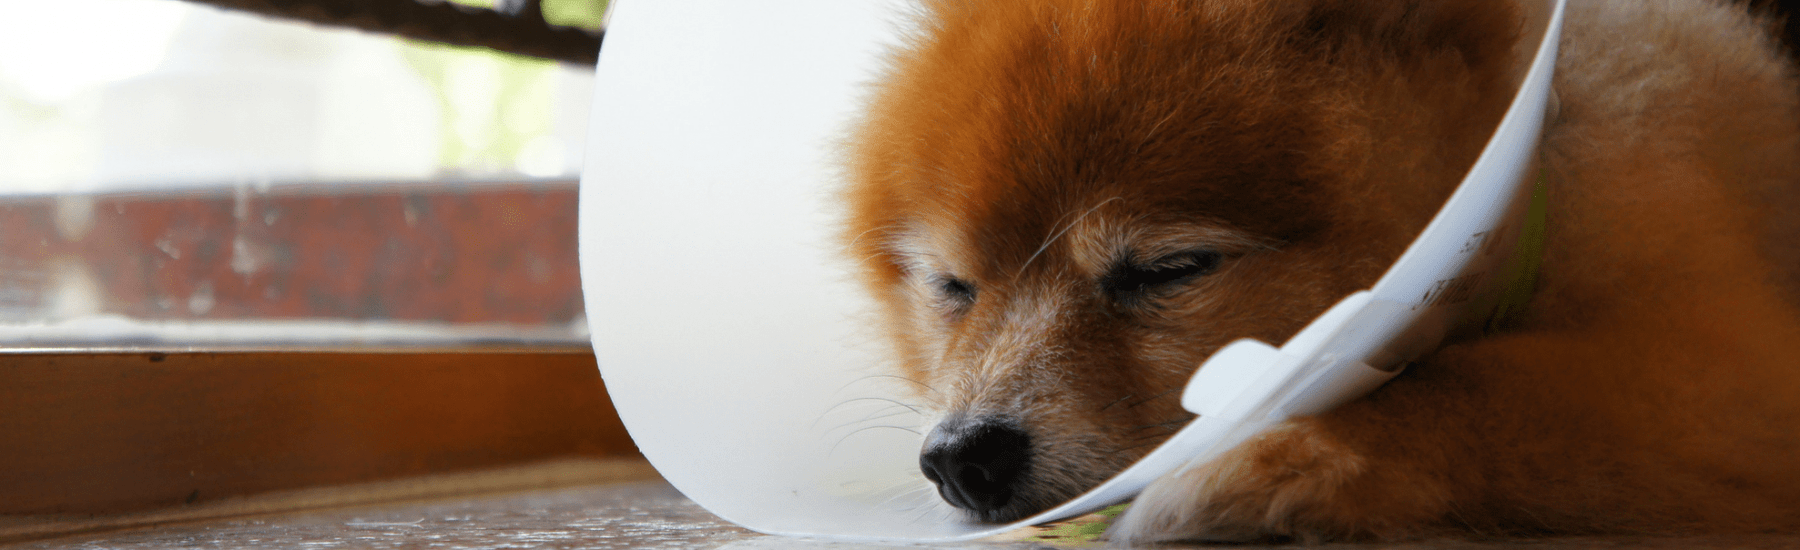 Sleeping dog wearing a cone